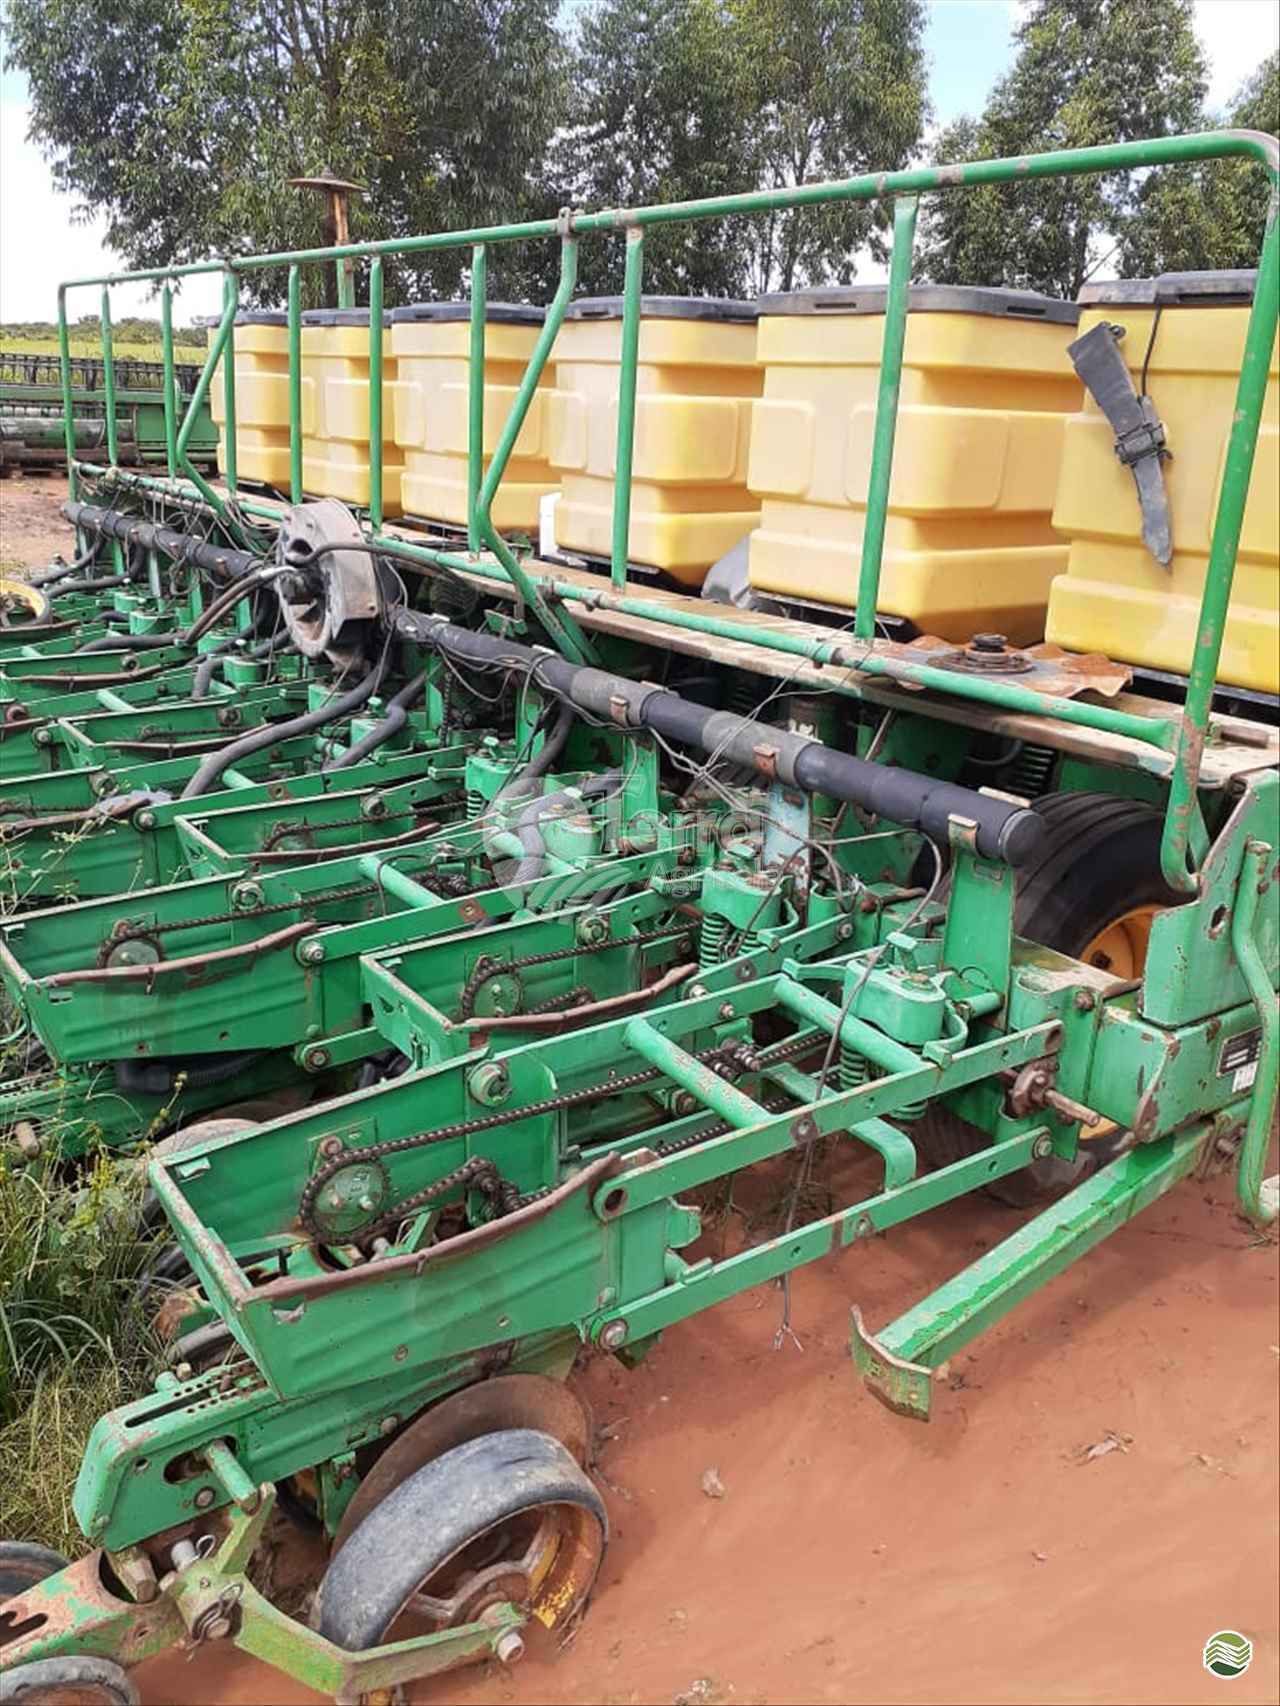 PLANTADEIRA JOHN DEERE PLANTADEIRAS 9213 Terra Agrícola DIAMANTINO MATO GROSSO MT